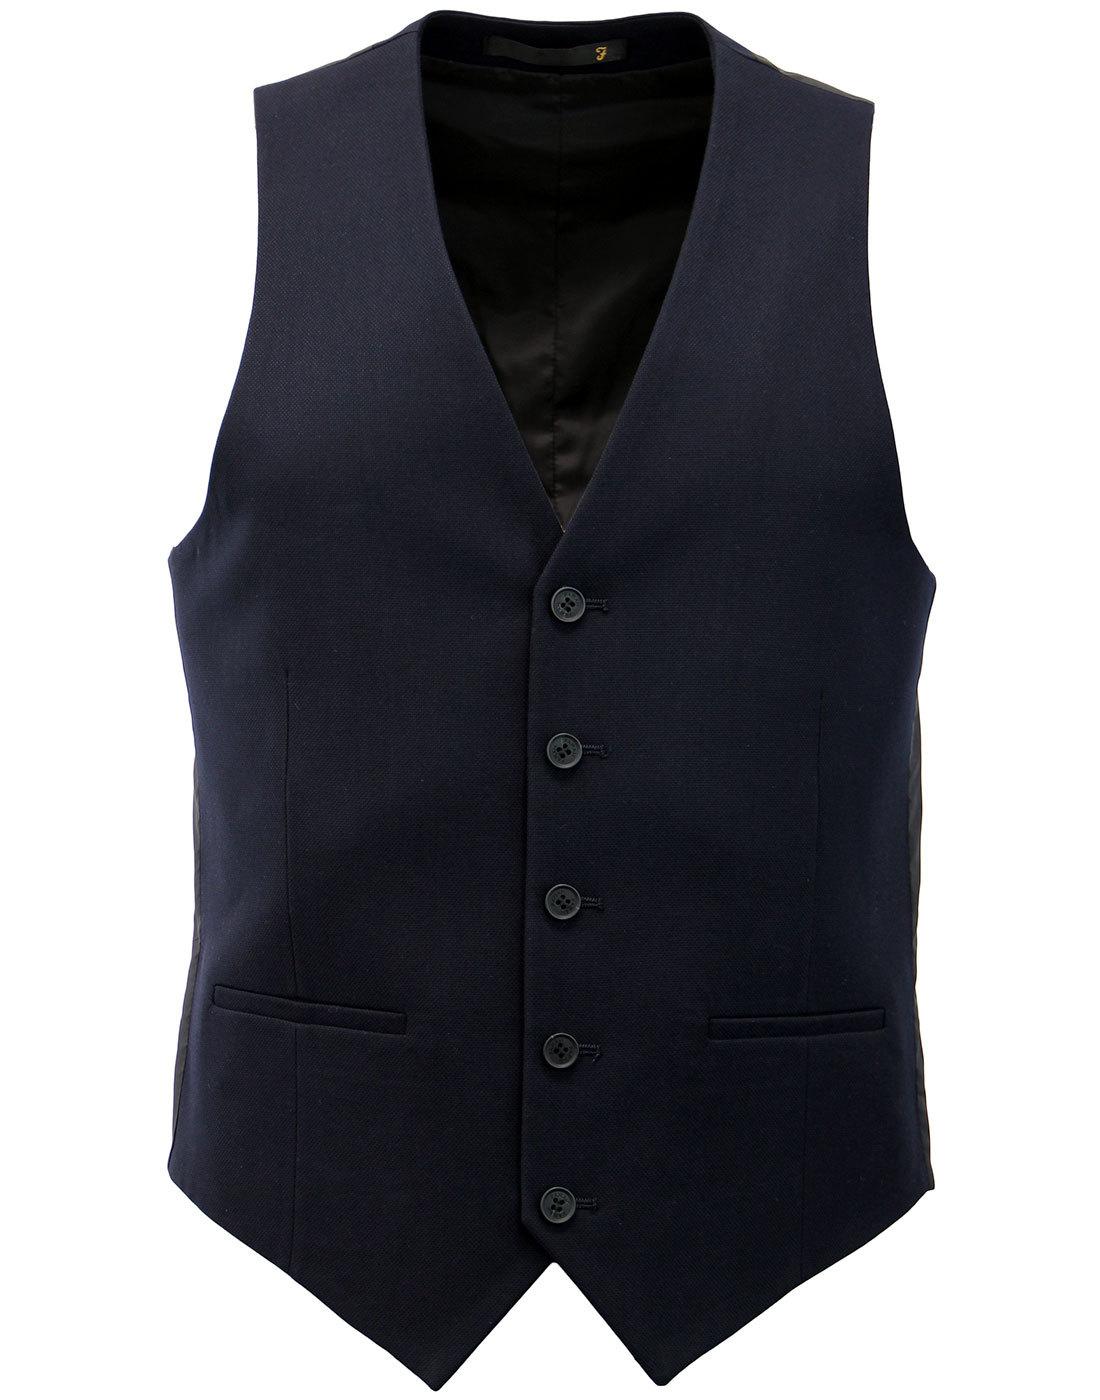 Hampton FARAH Retro 60s Mod Hopsack Slim Waistcoat